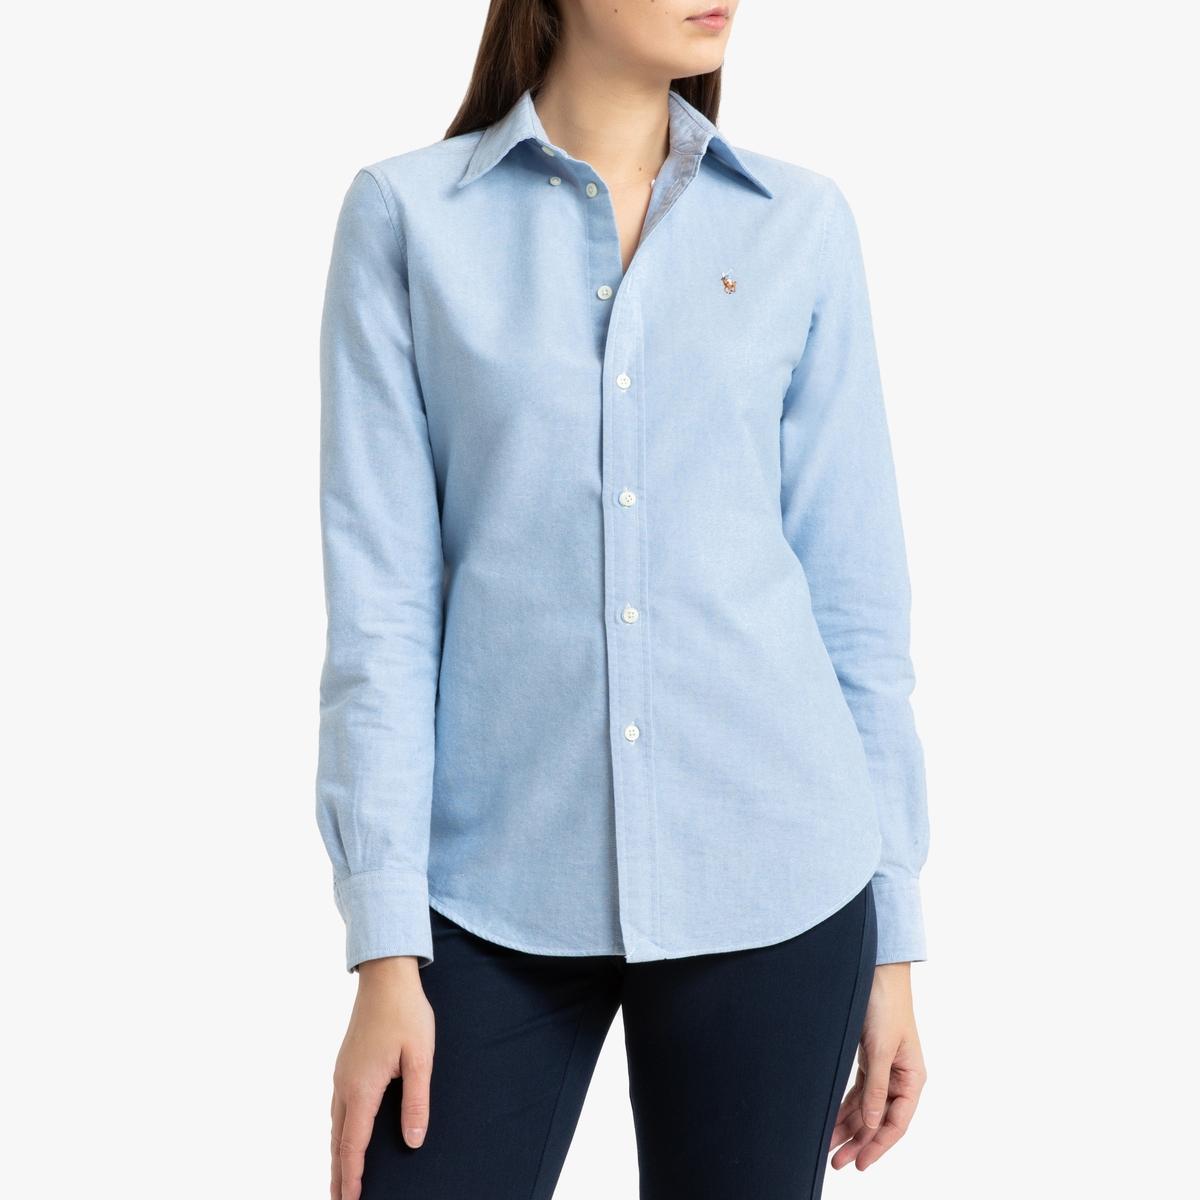 Рубашка LaRedoute Из ткани Oxford с длинными рукавами S синий